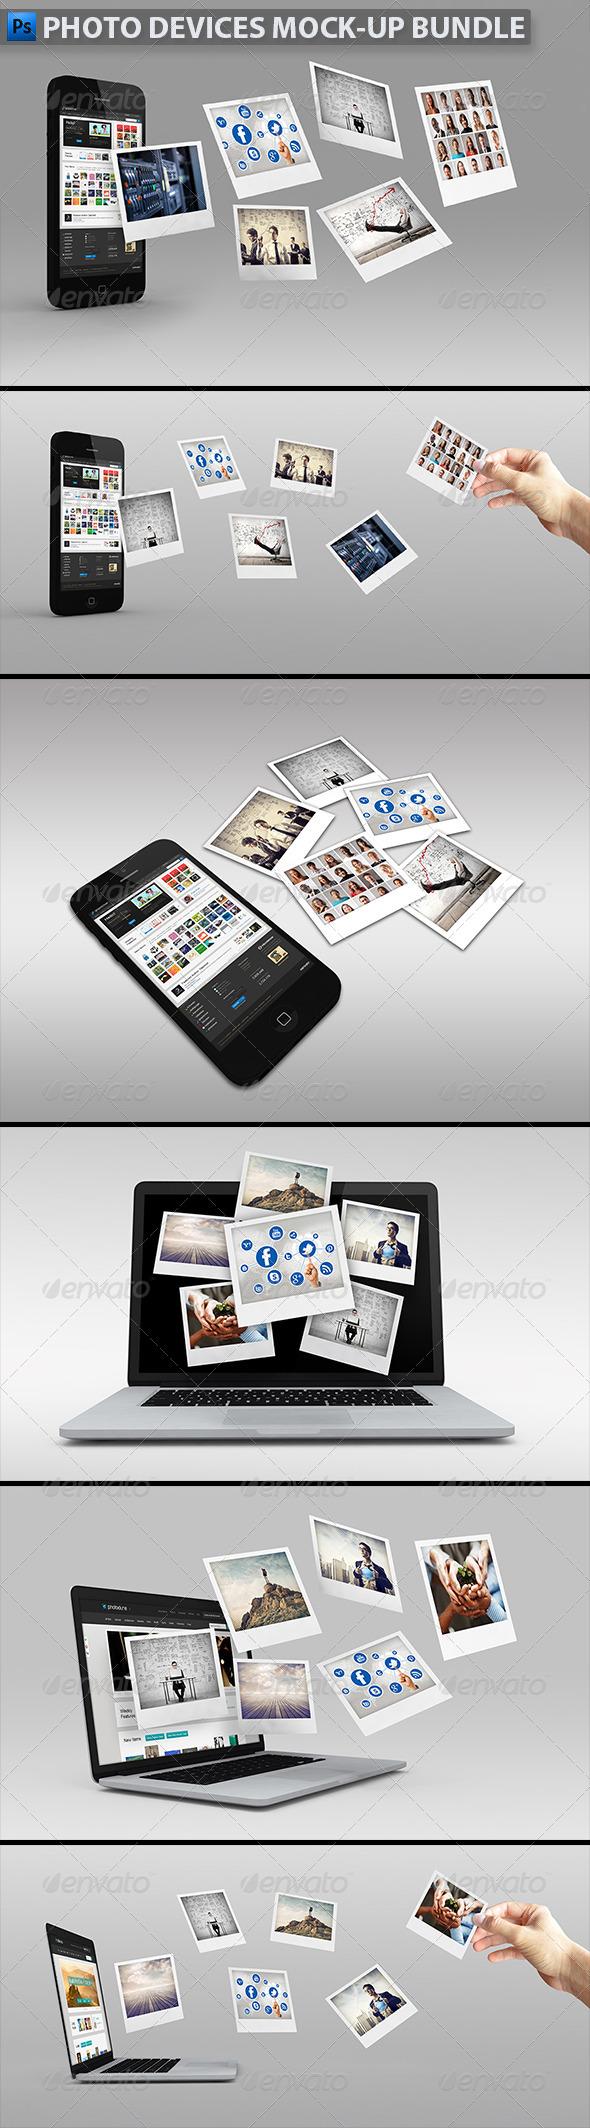 GraphicRiver Photo Devices Mock-up Bundle 5328350